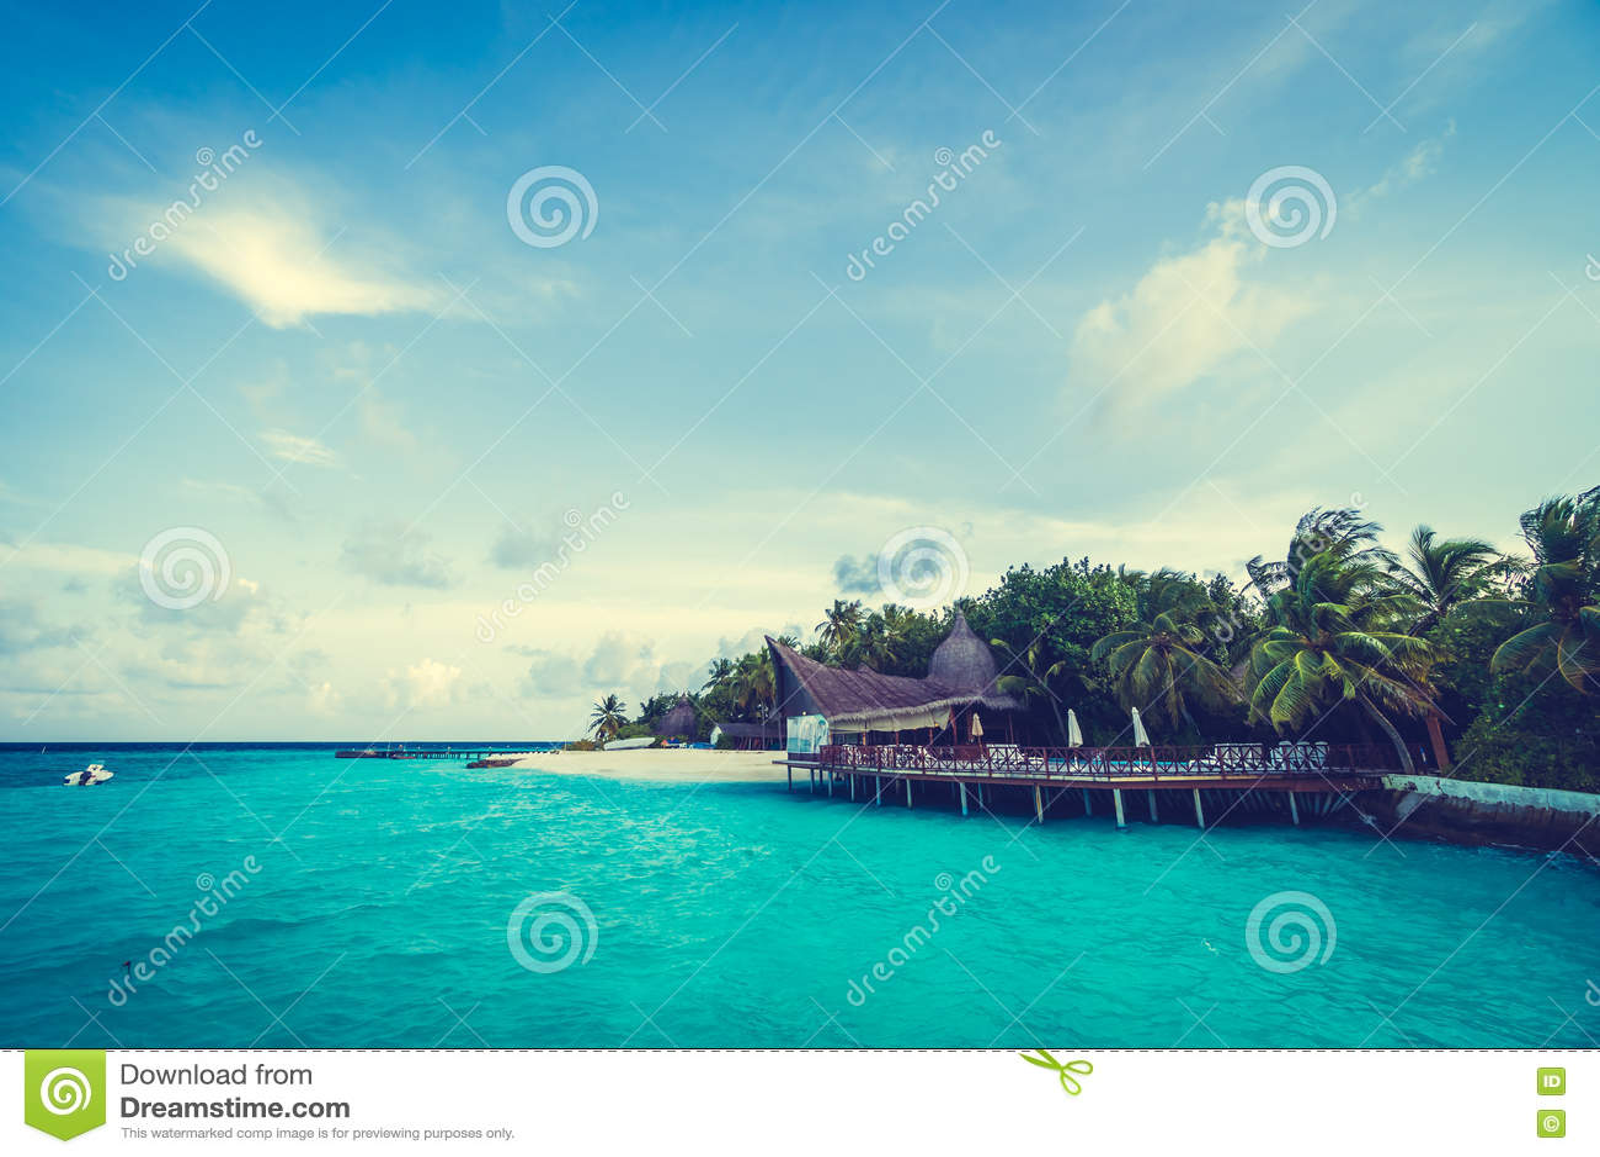 maldives island stock photo image 73122395. Black Bedroom Furniture Sets. Home Design Ideas